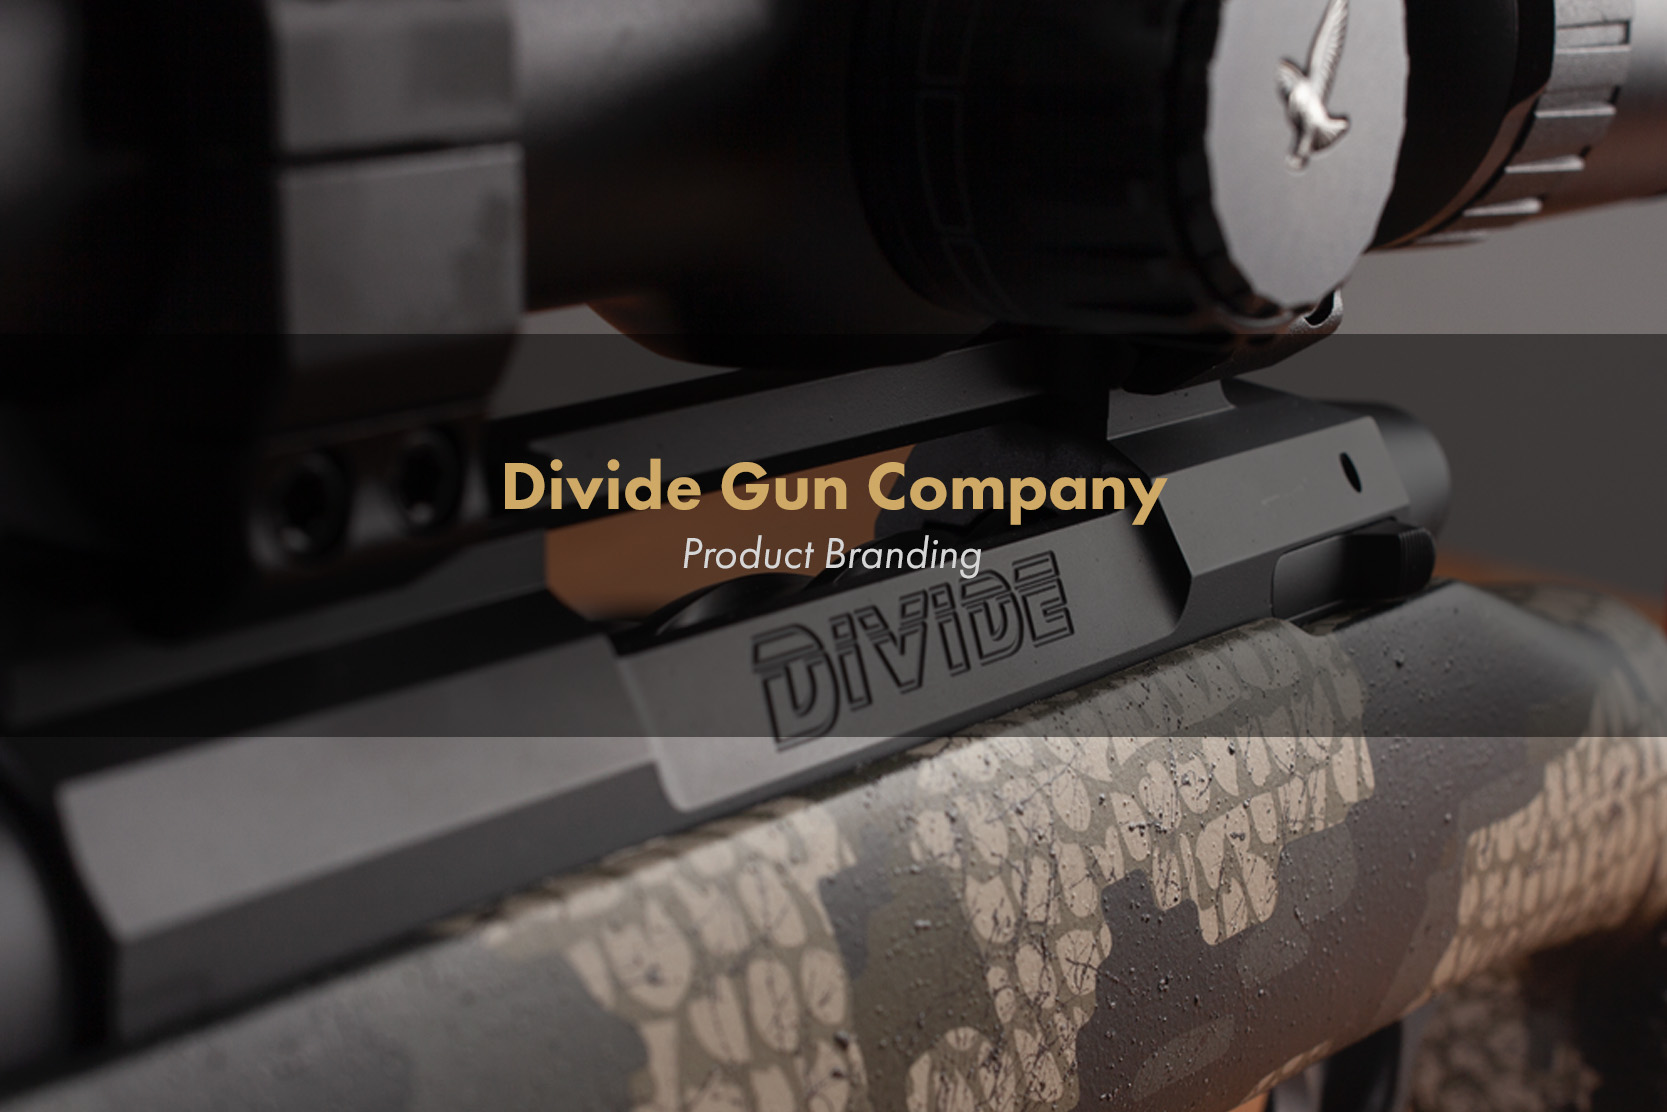 DivideGunCompany.jpg